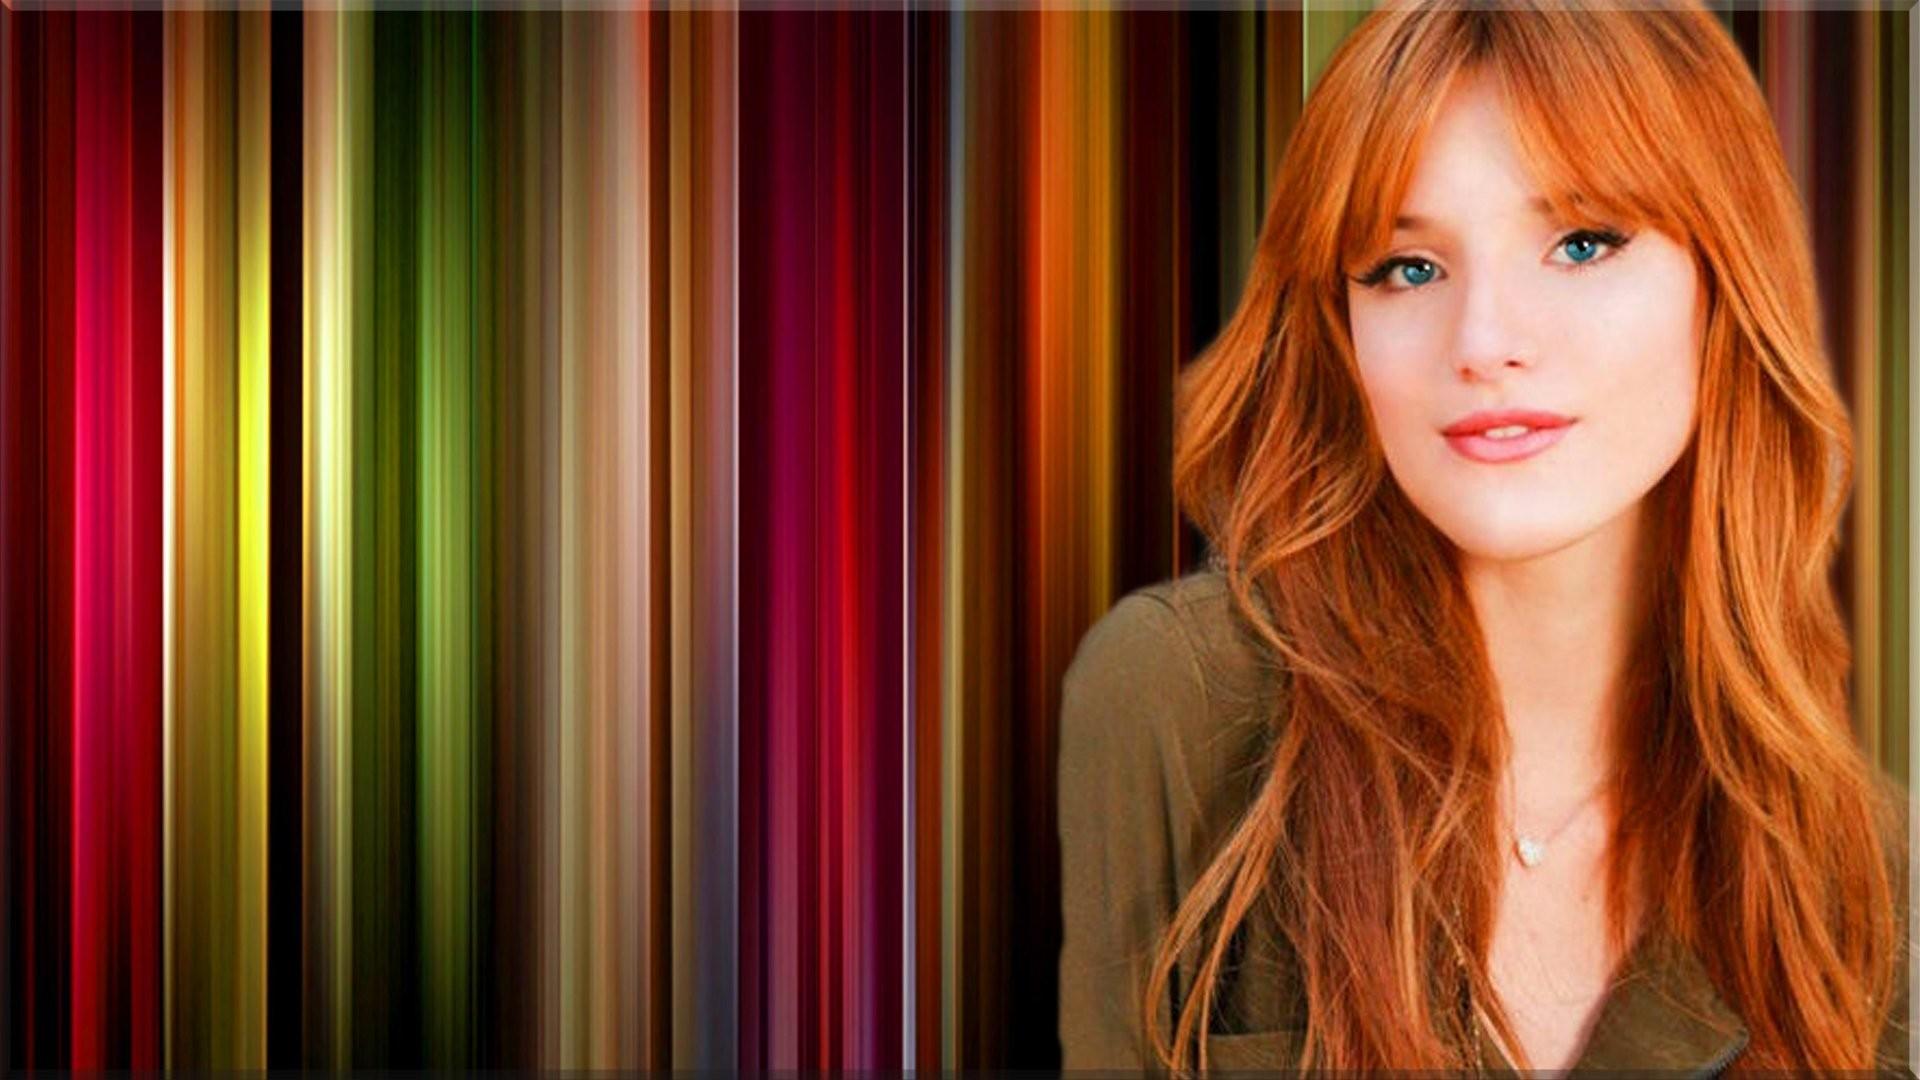 Celebrity – Bella Thorne Redhead Woman Wallpaper